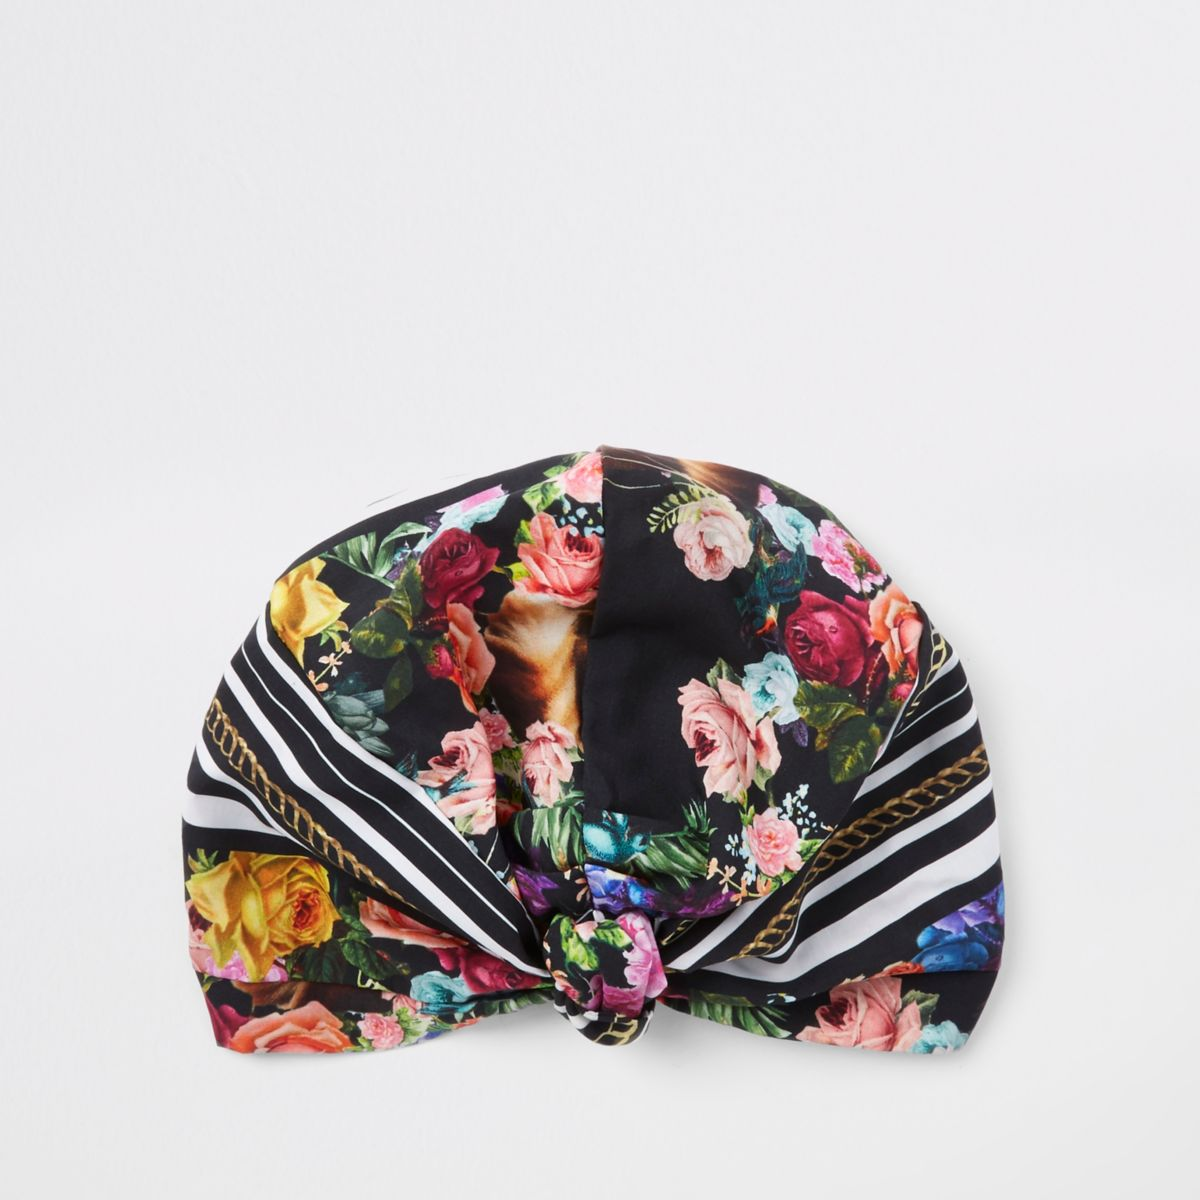 Black floral turban hat